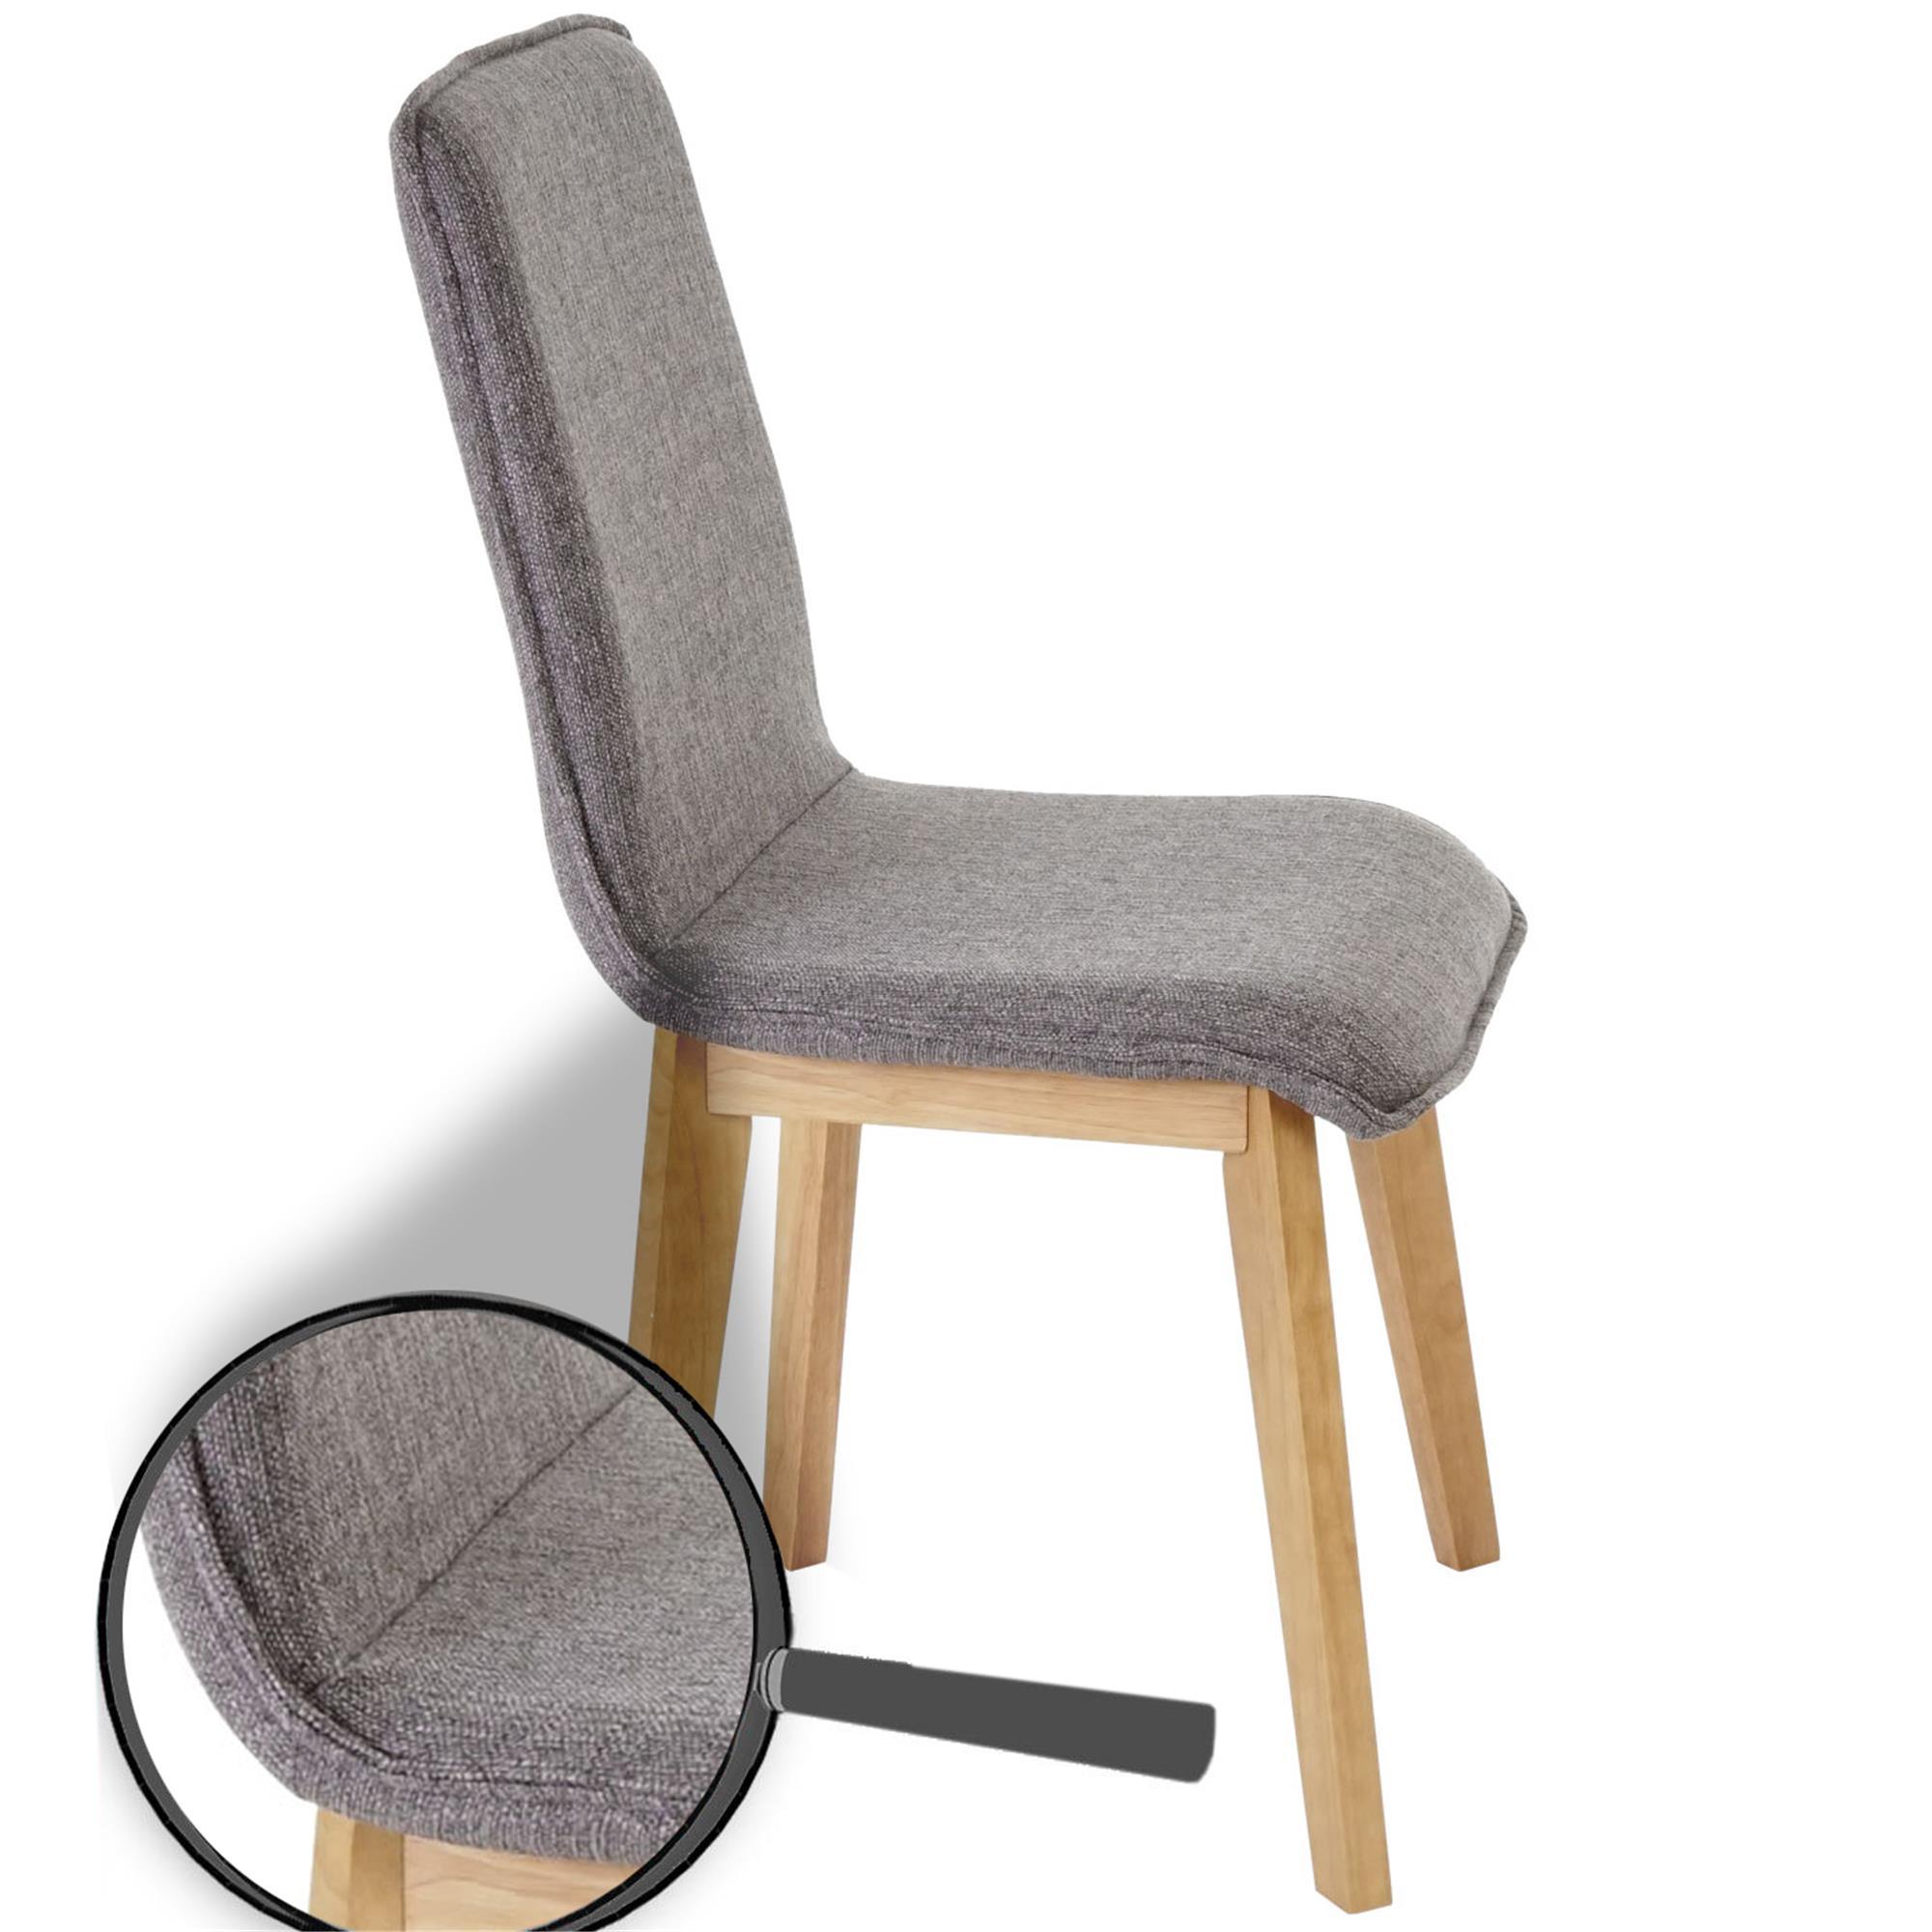 Lote 6 sillas de cocina o comedor ford en tela gris for Patas para muebles madera